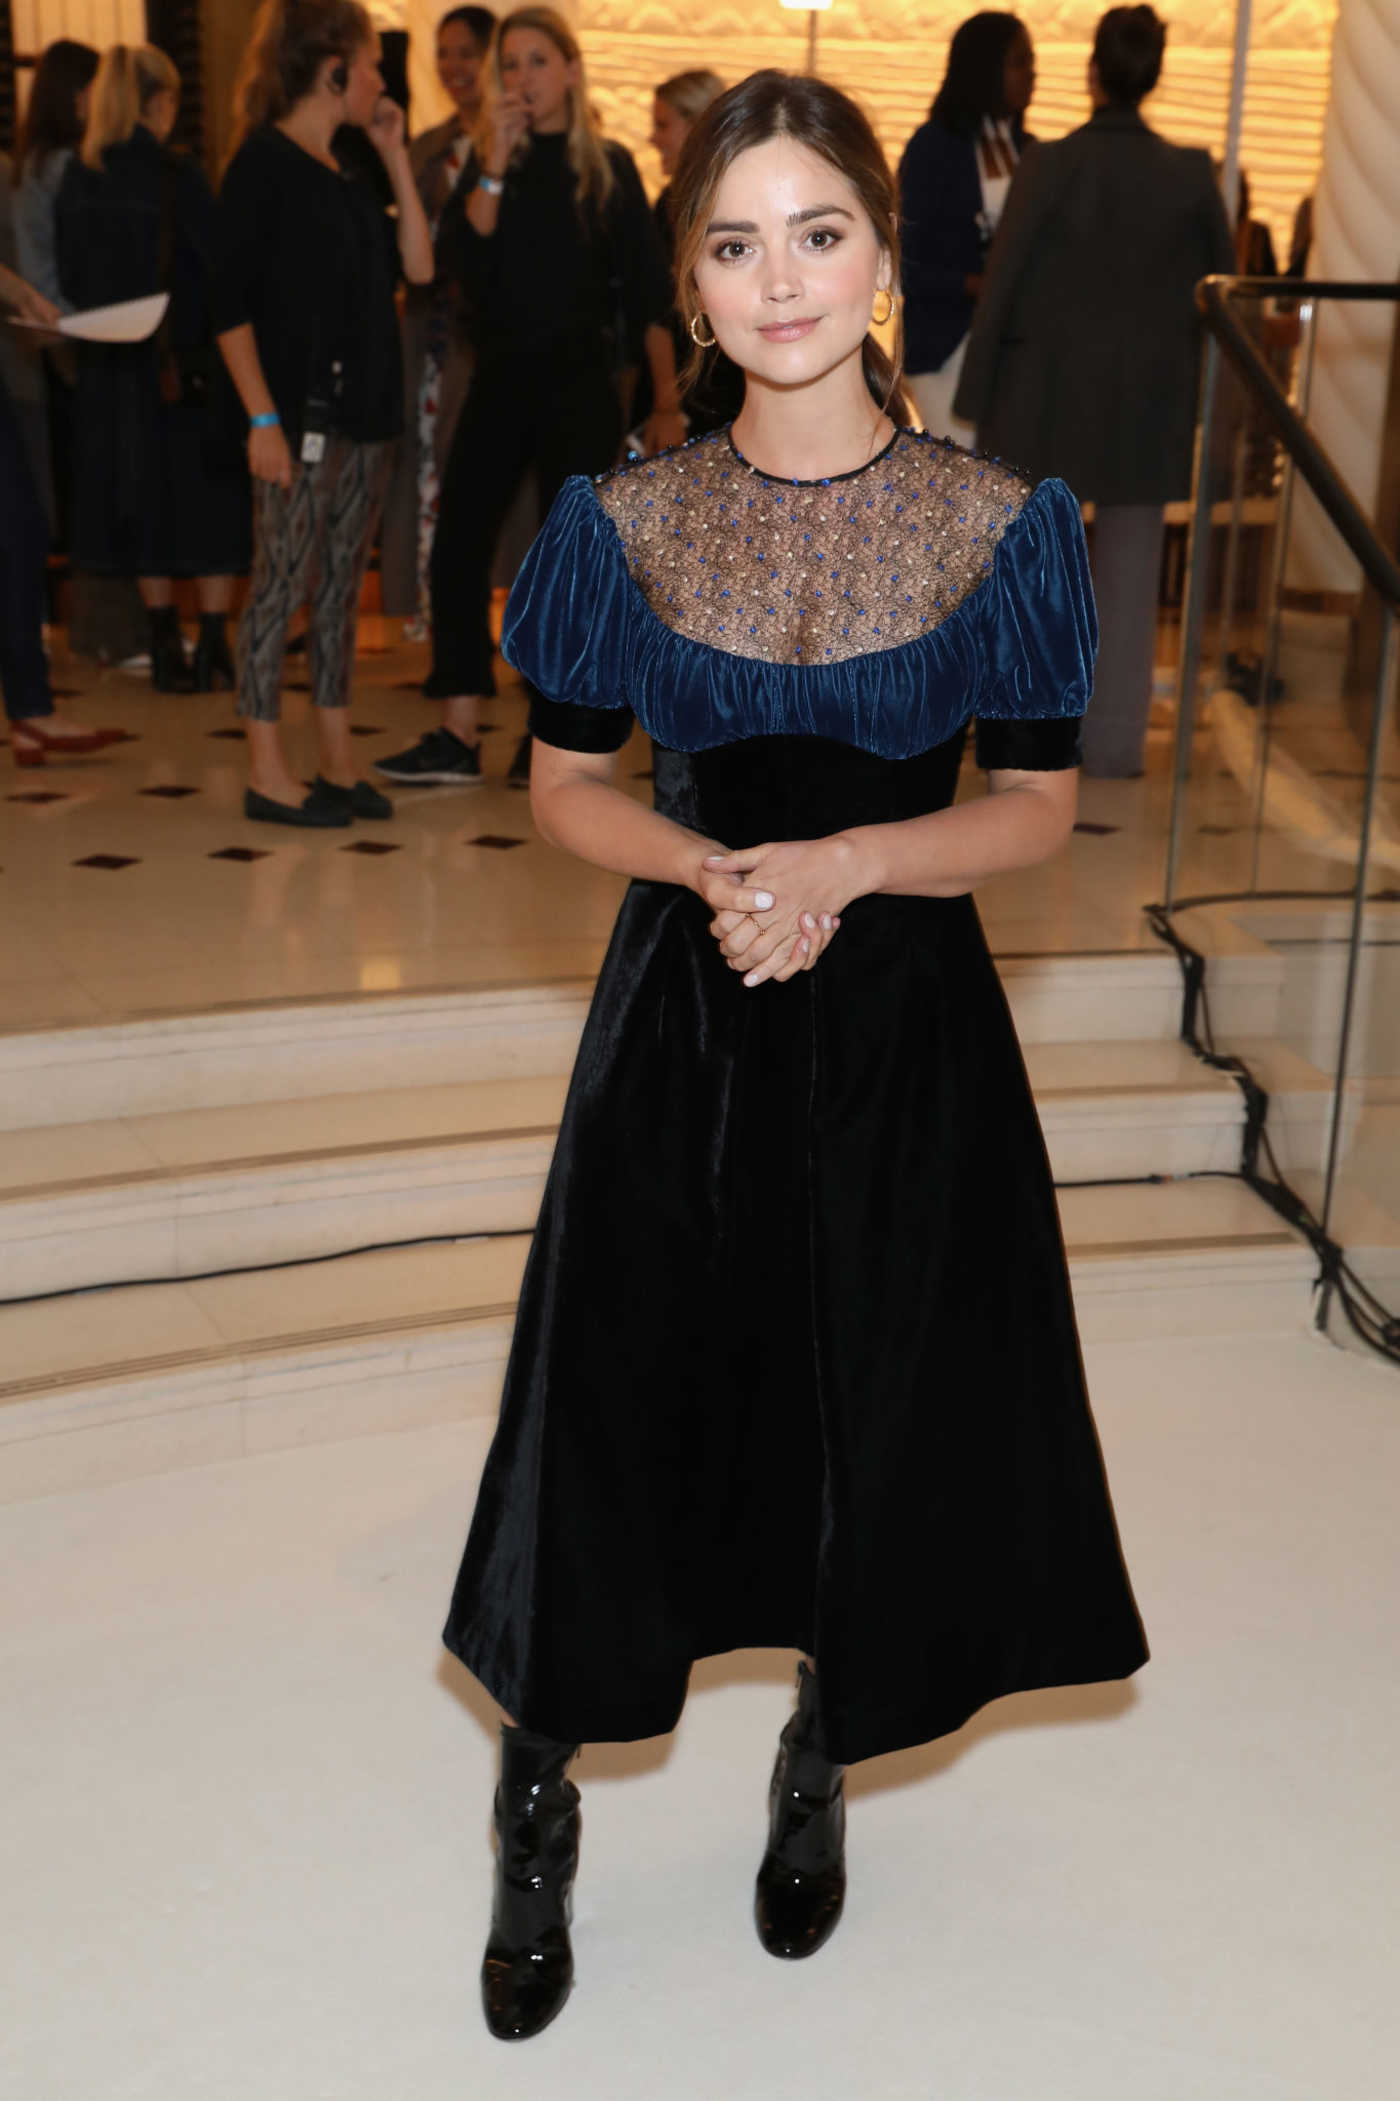 Jenna-Louise Coleman at Emilia Wickstead Fashion Show During London Fashion Week 09/18/2017